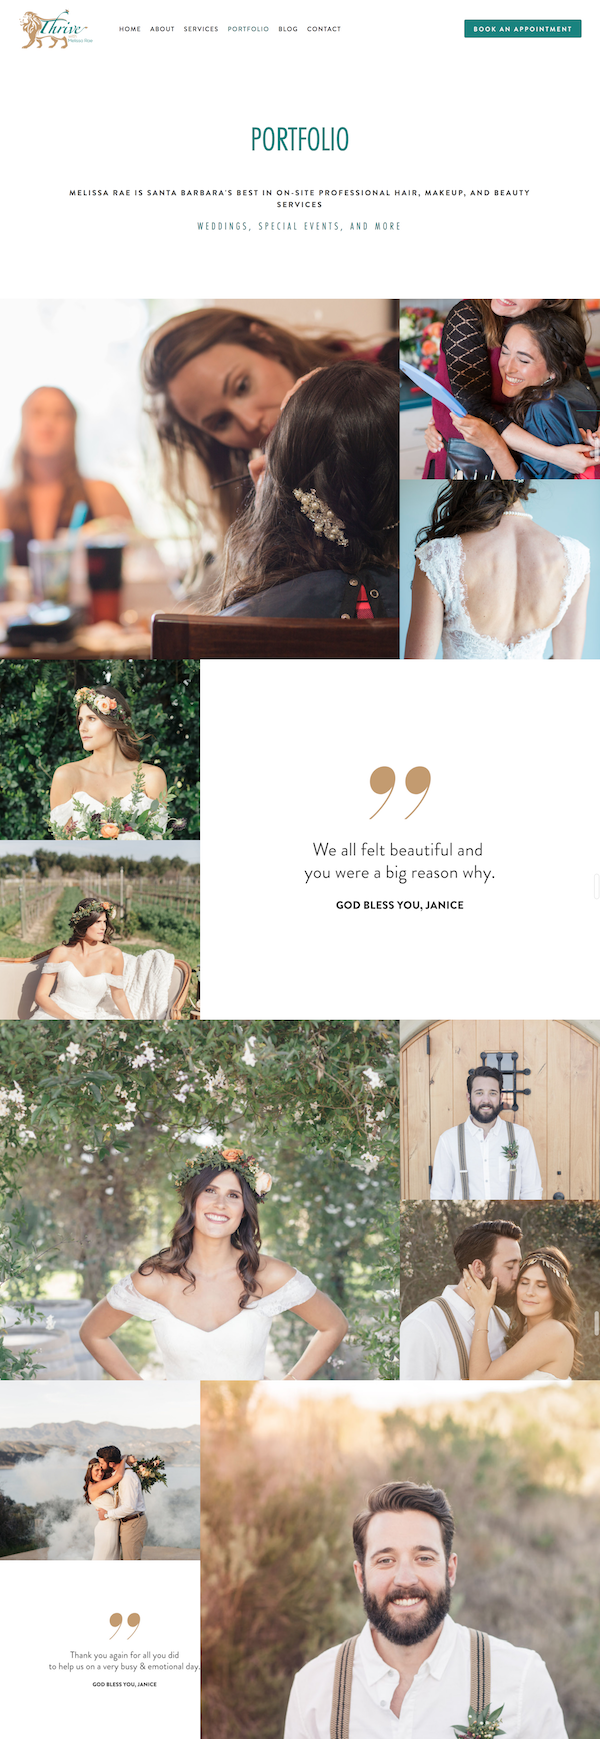 Portfolio — Thrive With Melissa Rae copy.png